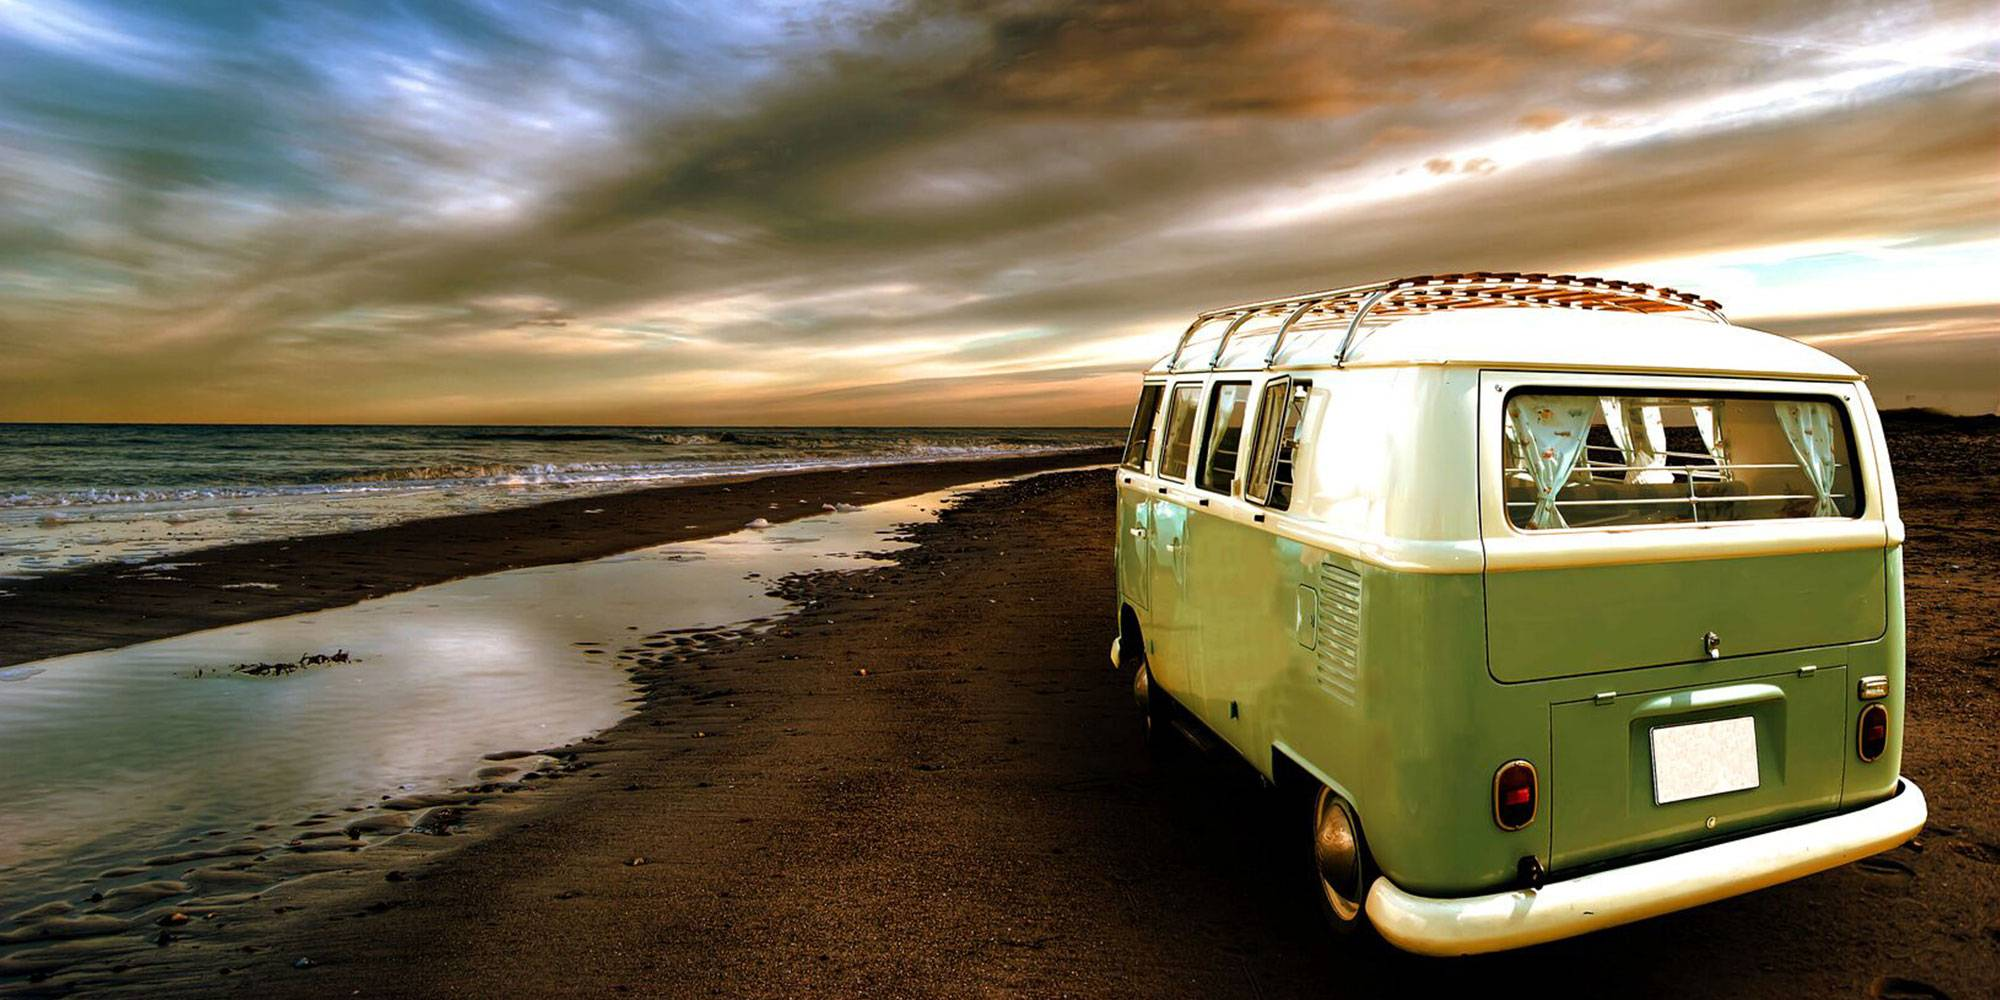 green vw campervan on beach